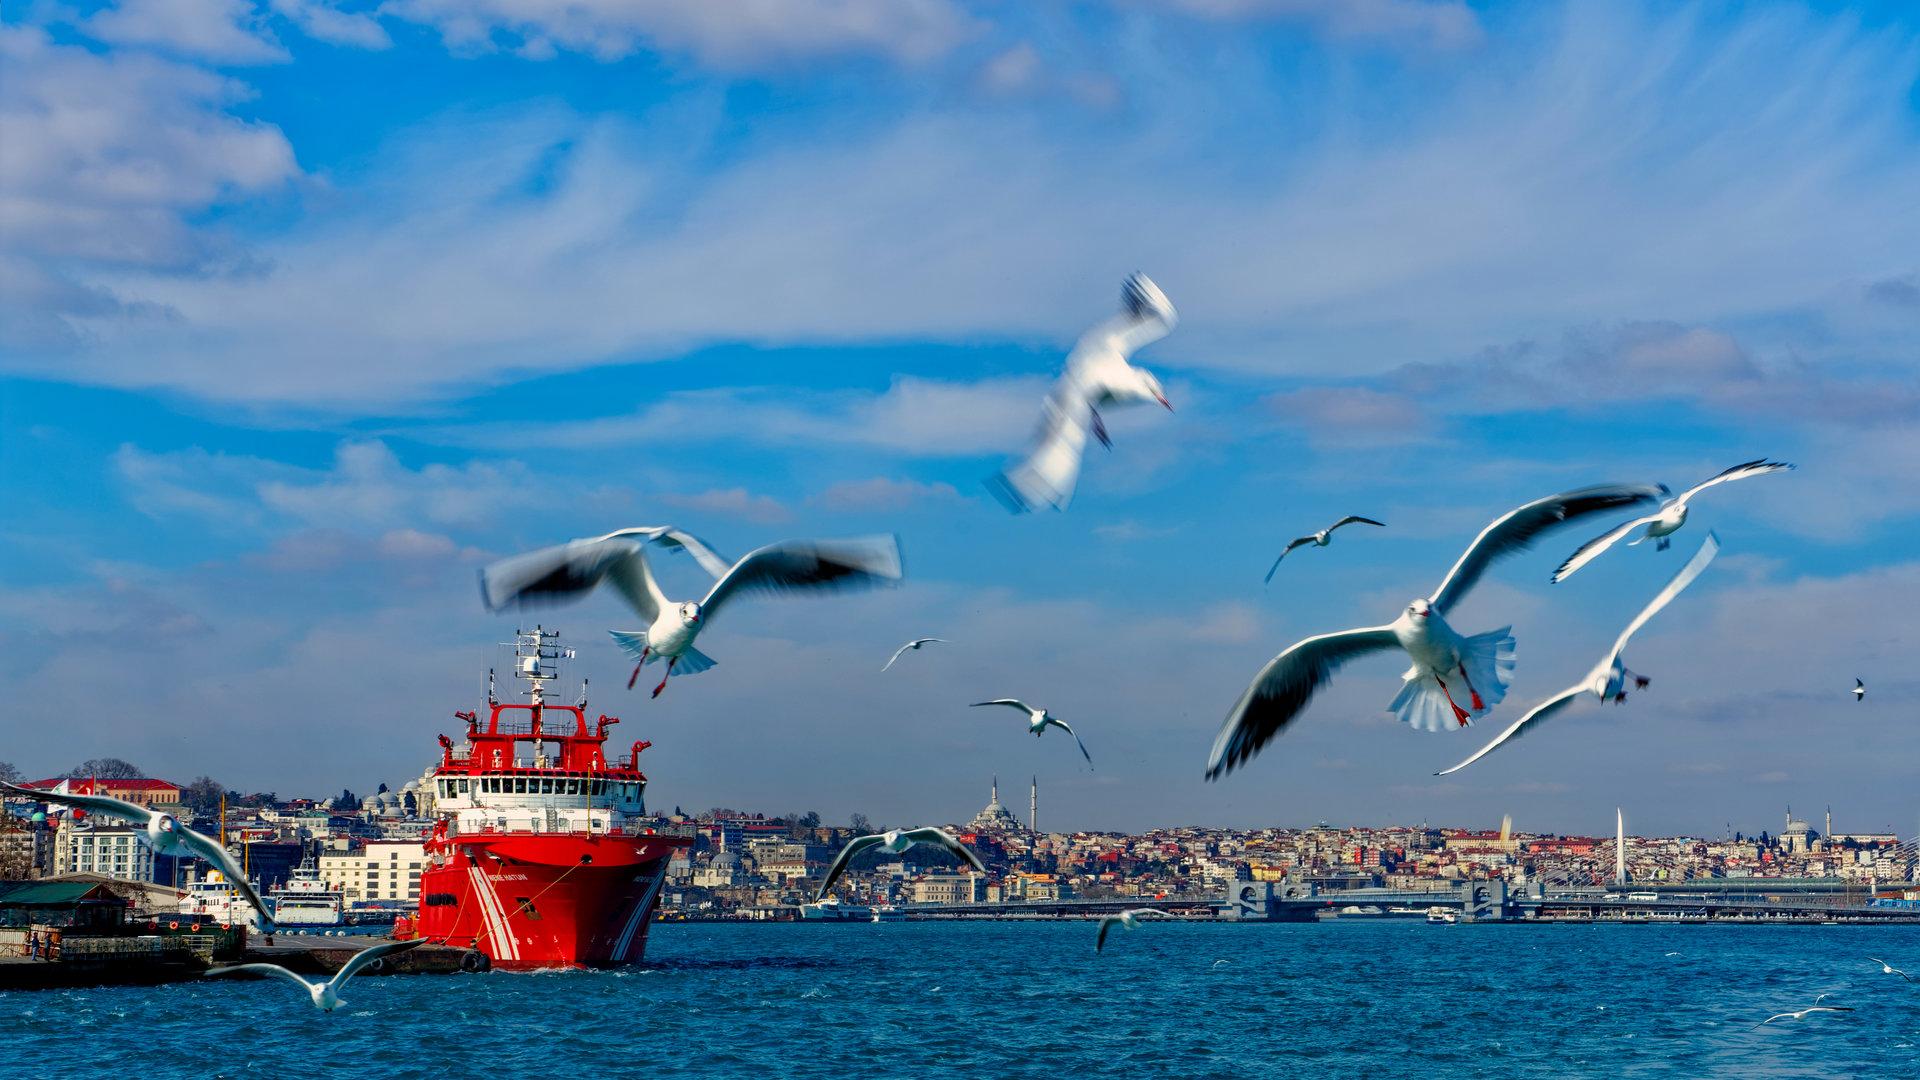 Photo in Travels | Author Arian Shkaki - MrBean | PHOTO FORUM